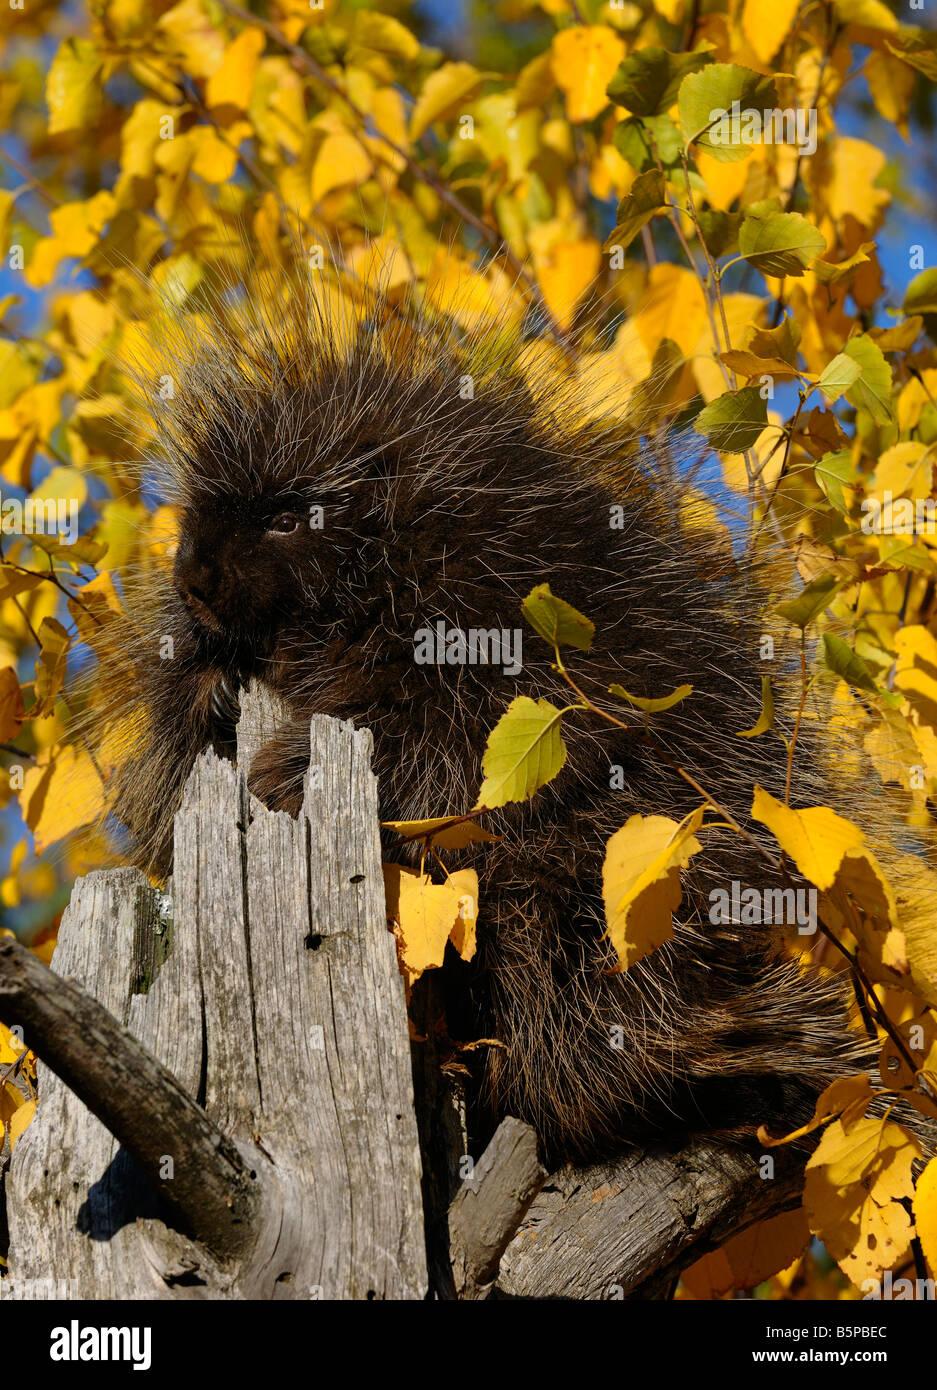 North American Porcupine on tree stump in full sun with yellow Birch leaves in Autumn Erethizon Dorsatum Minnesota Stock Photo